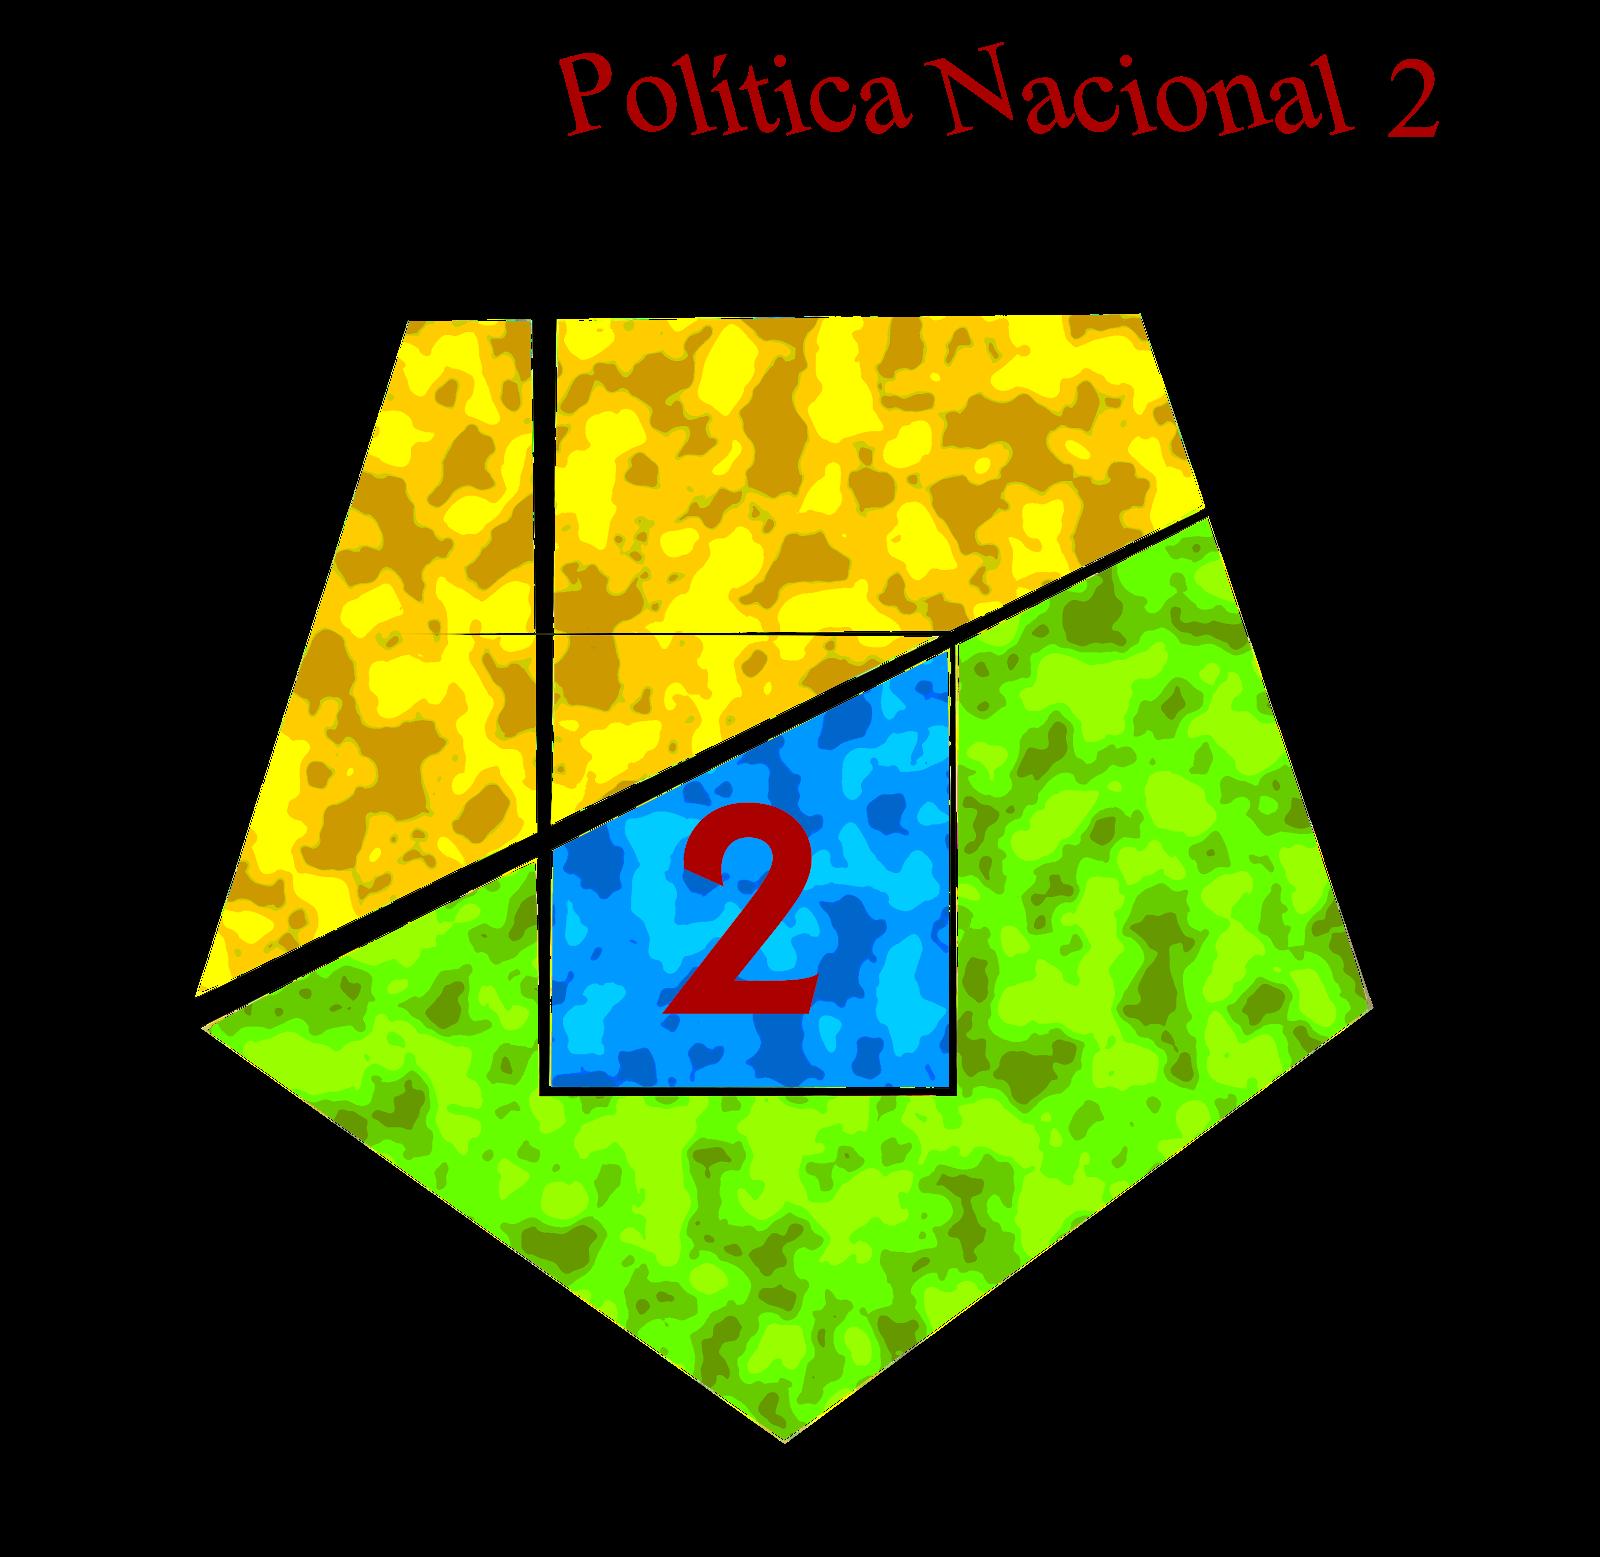 Política Nacional 2